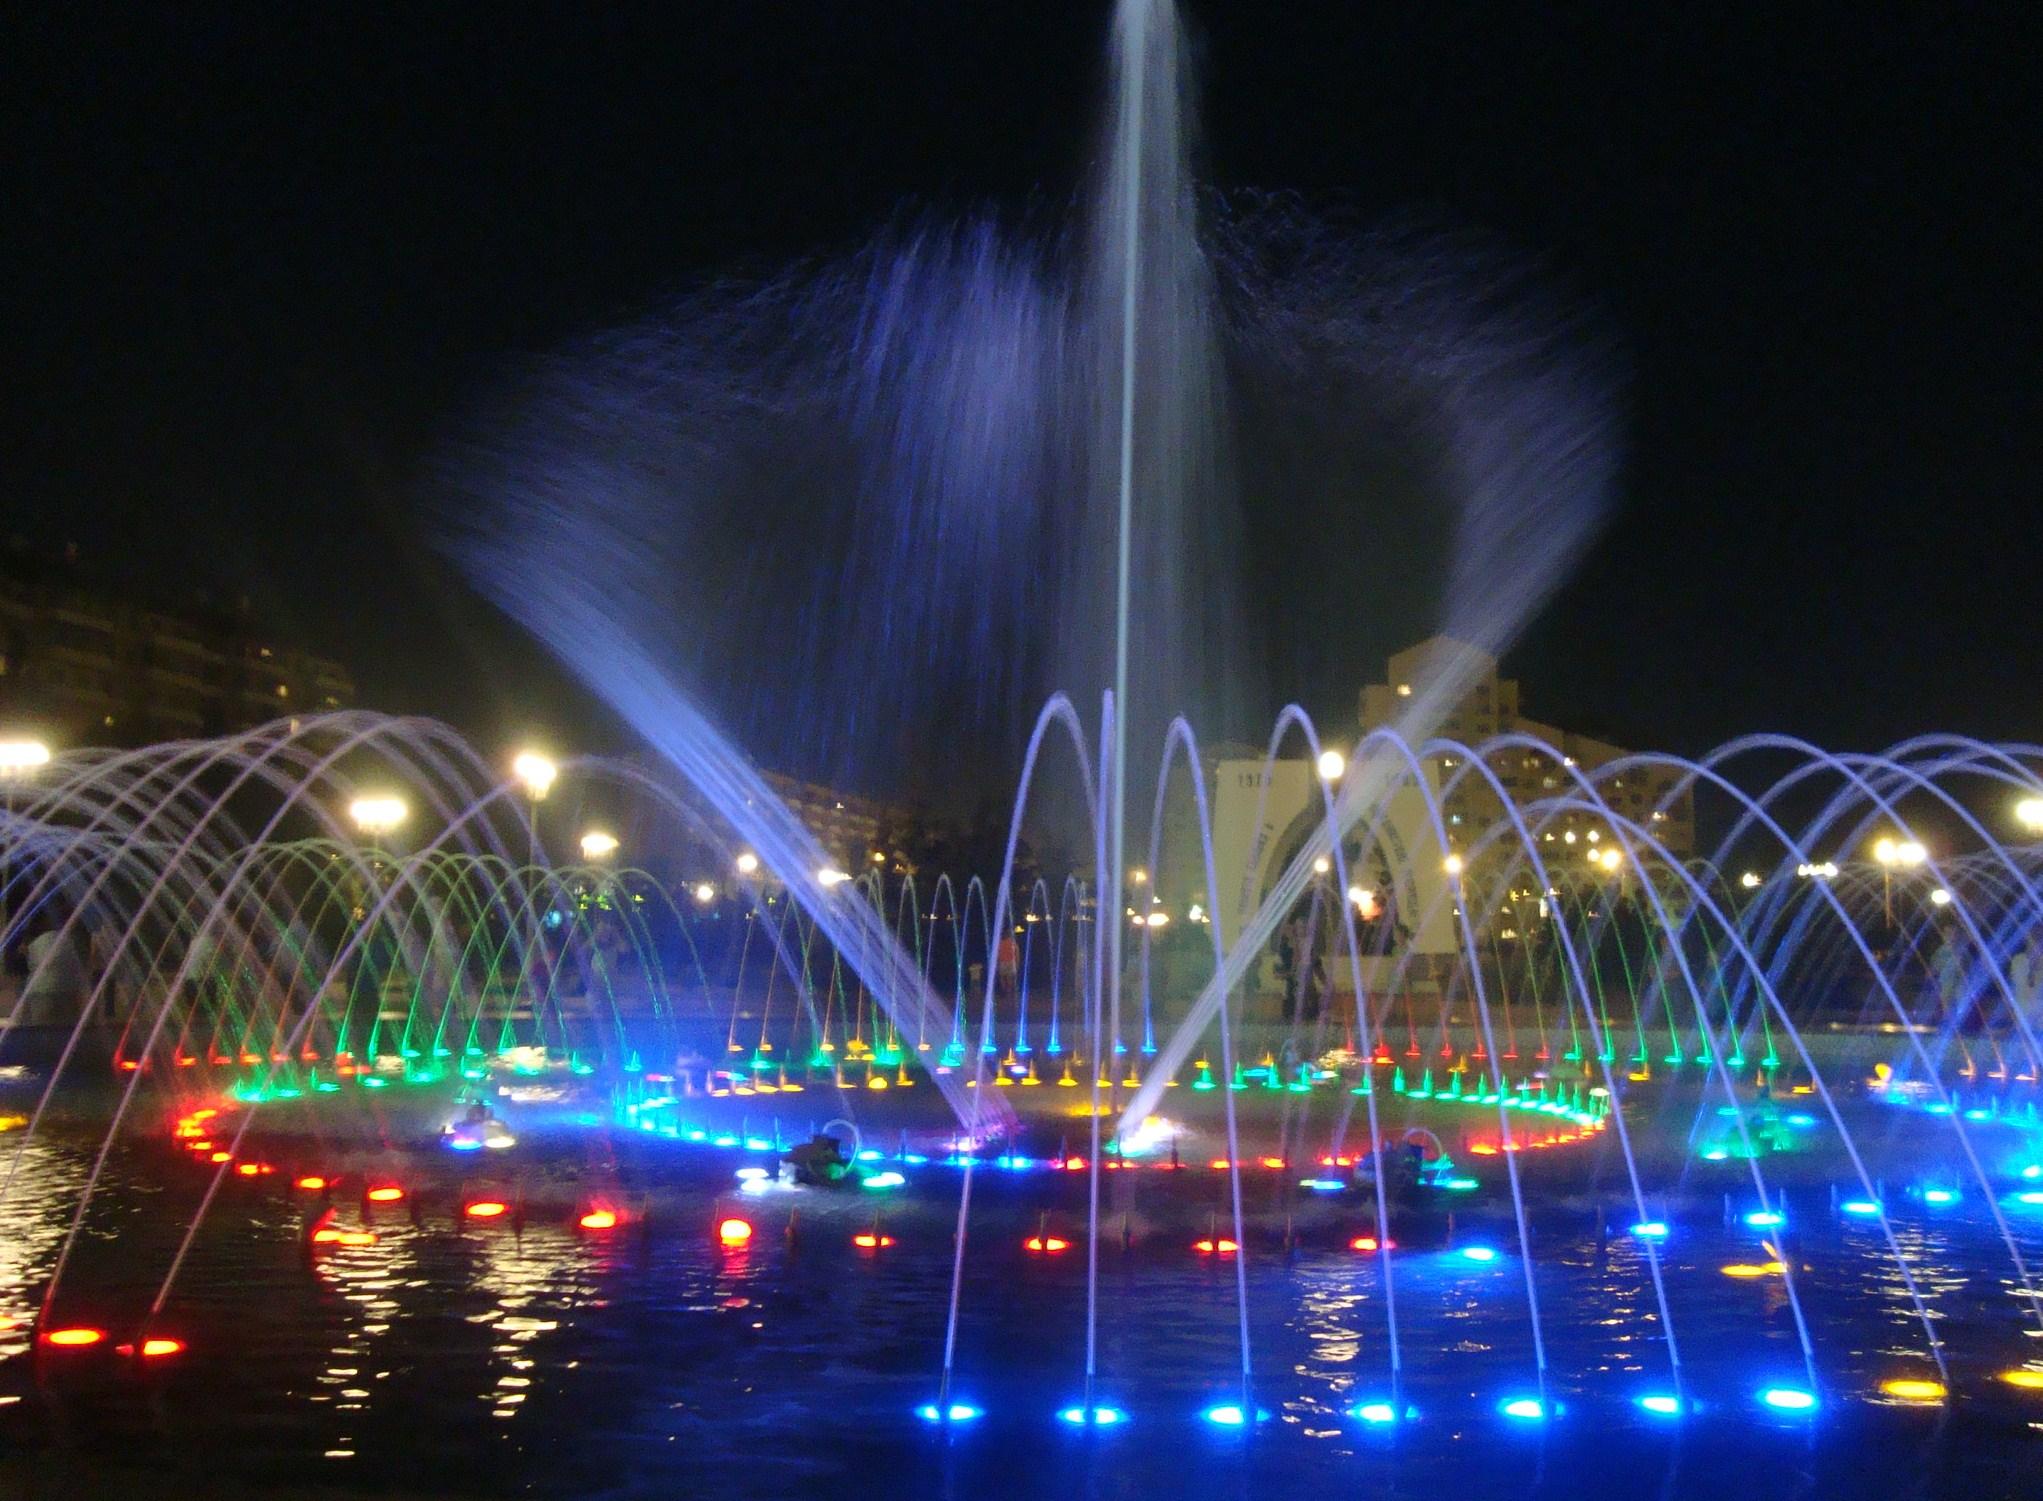 http://belfontan.ru/sites/belfontan.ru/gallery/f4.jpg